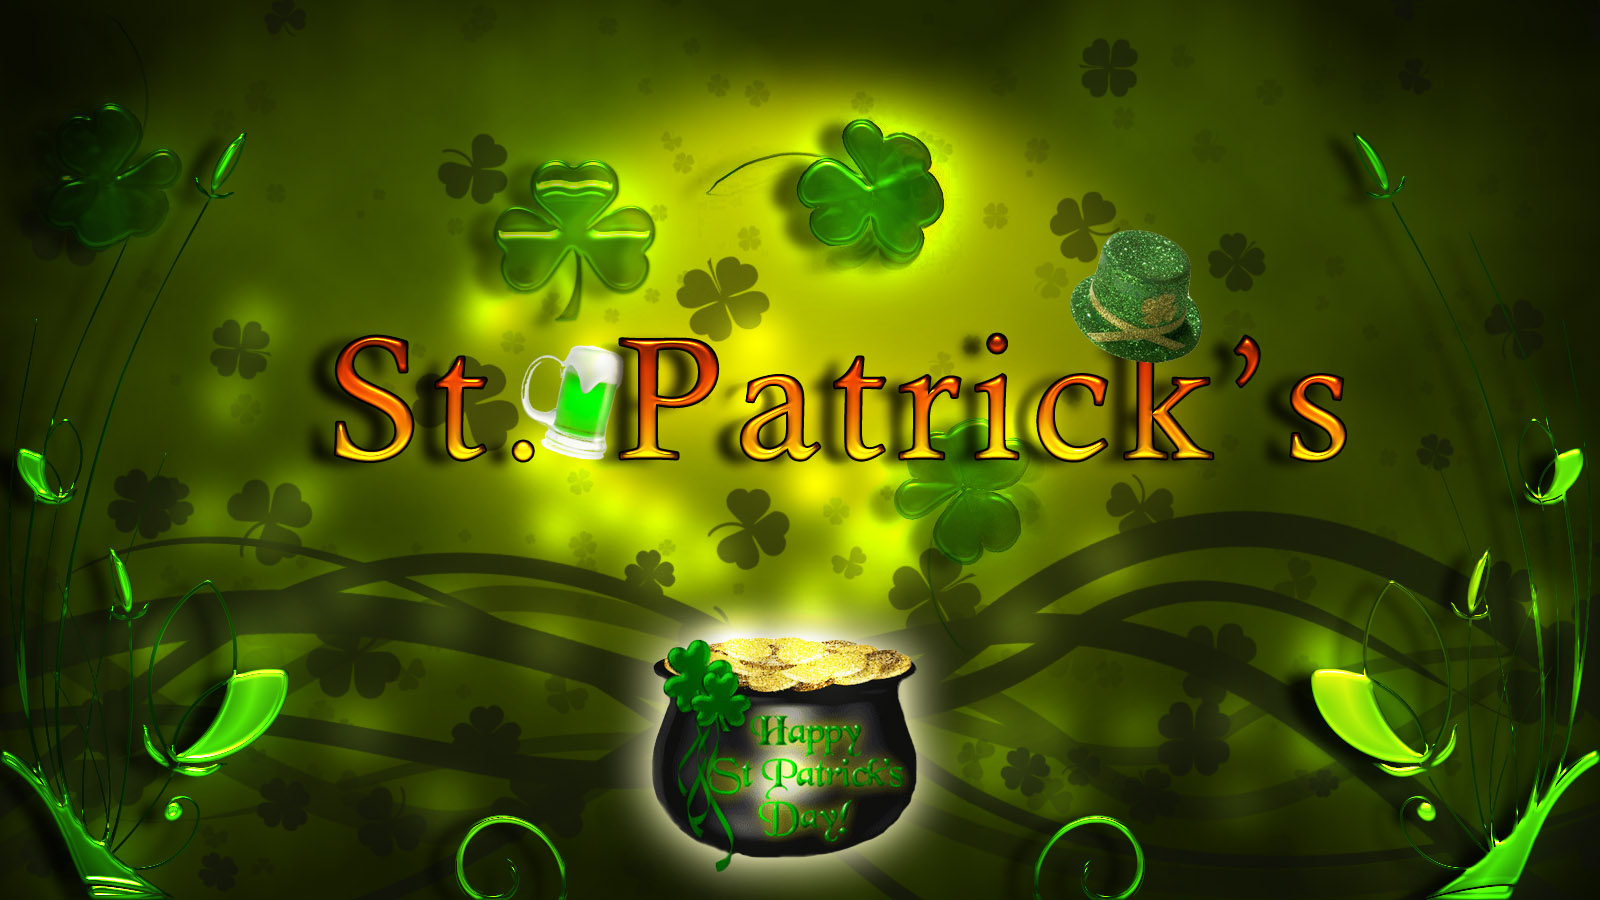 St Patricks Day wallpaper   ForWallpapercom 1600x900